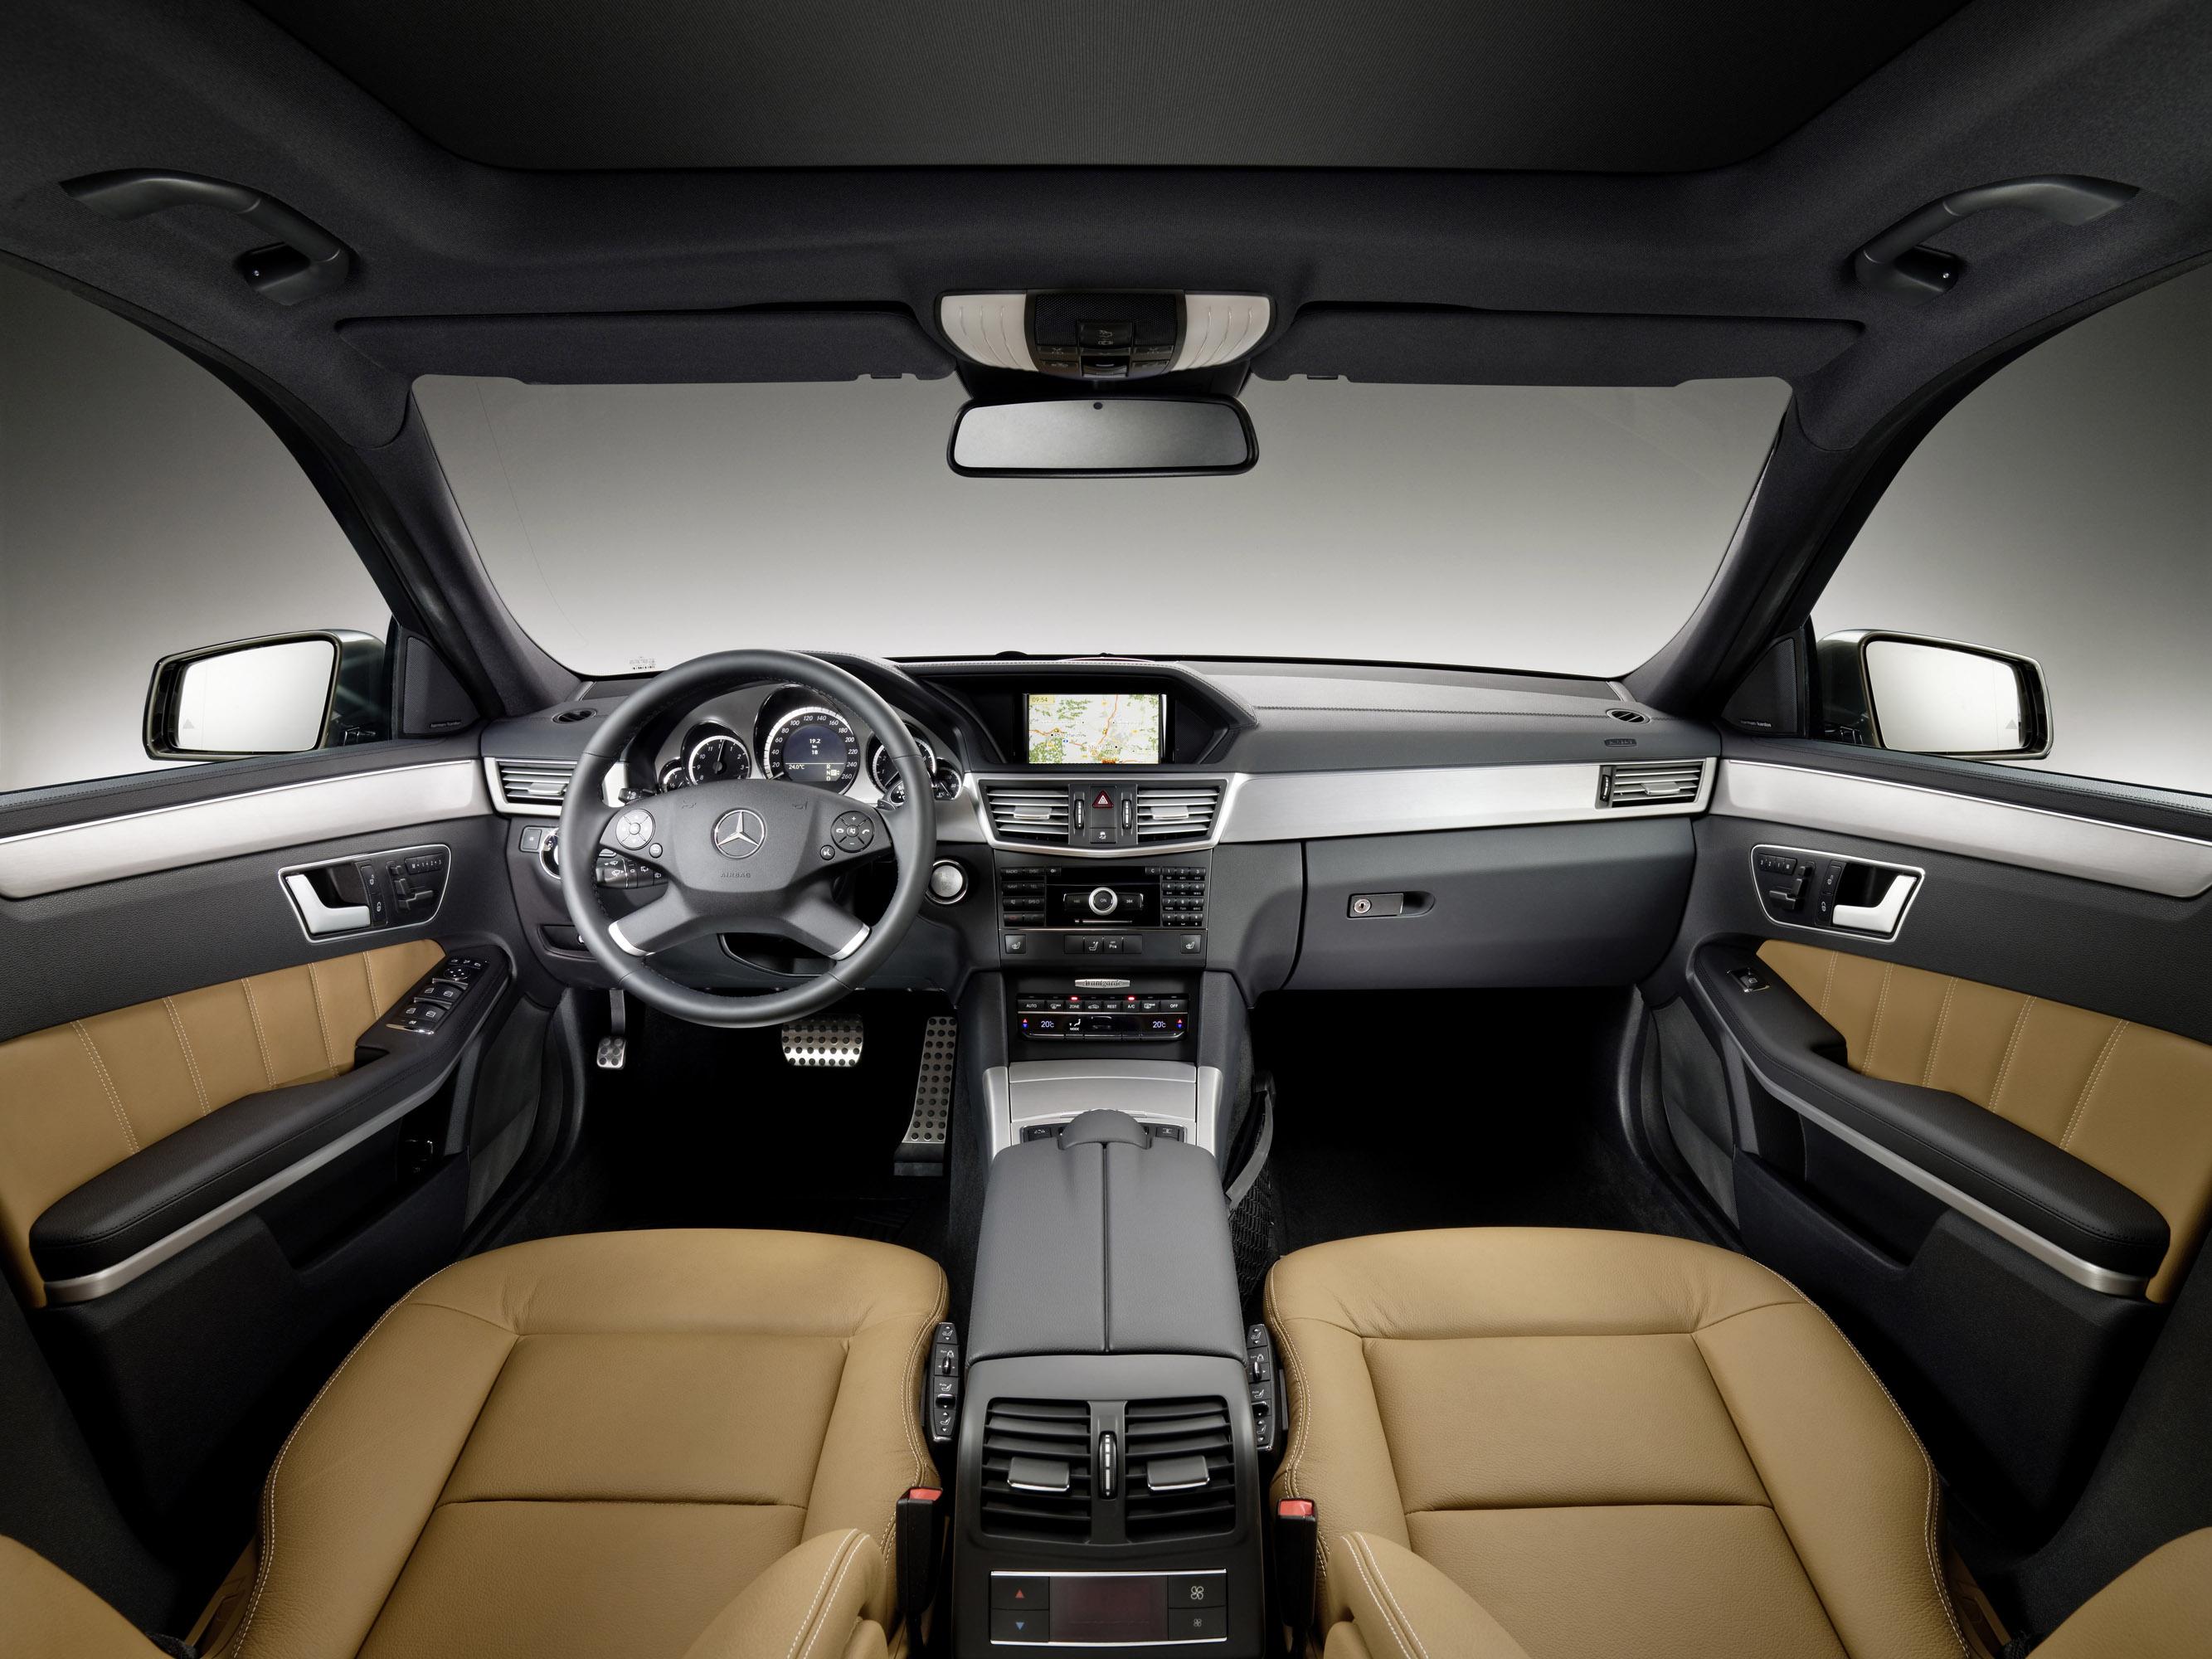 Mercedes-Benz E-Class Универсал - фотография №2